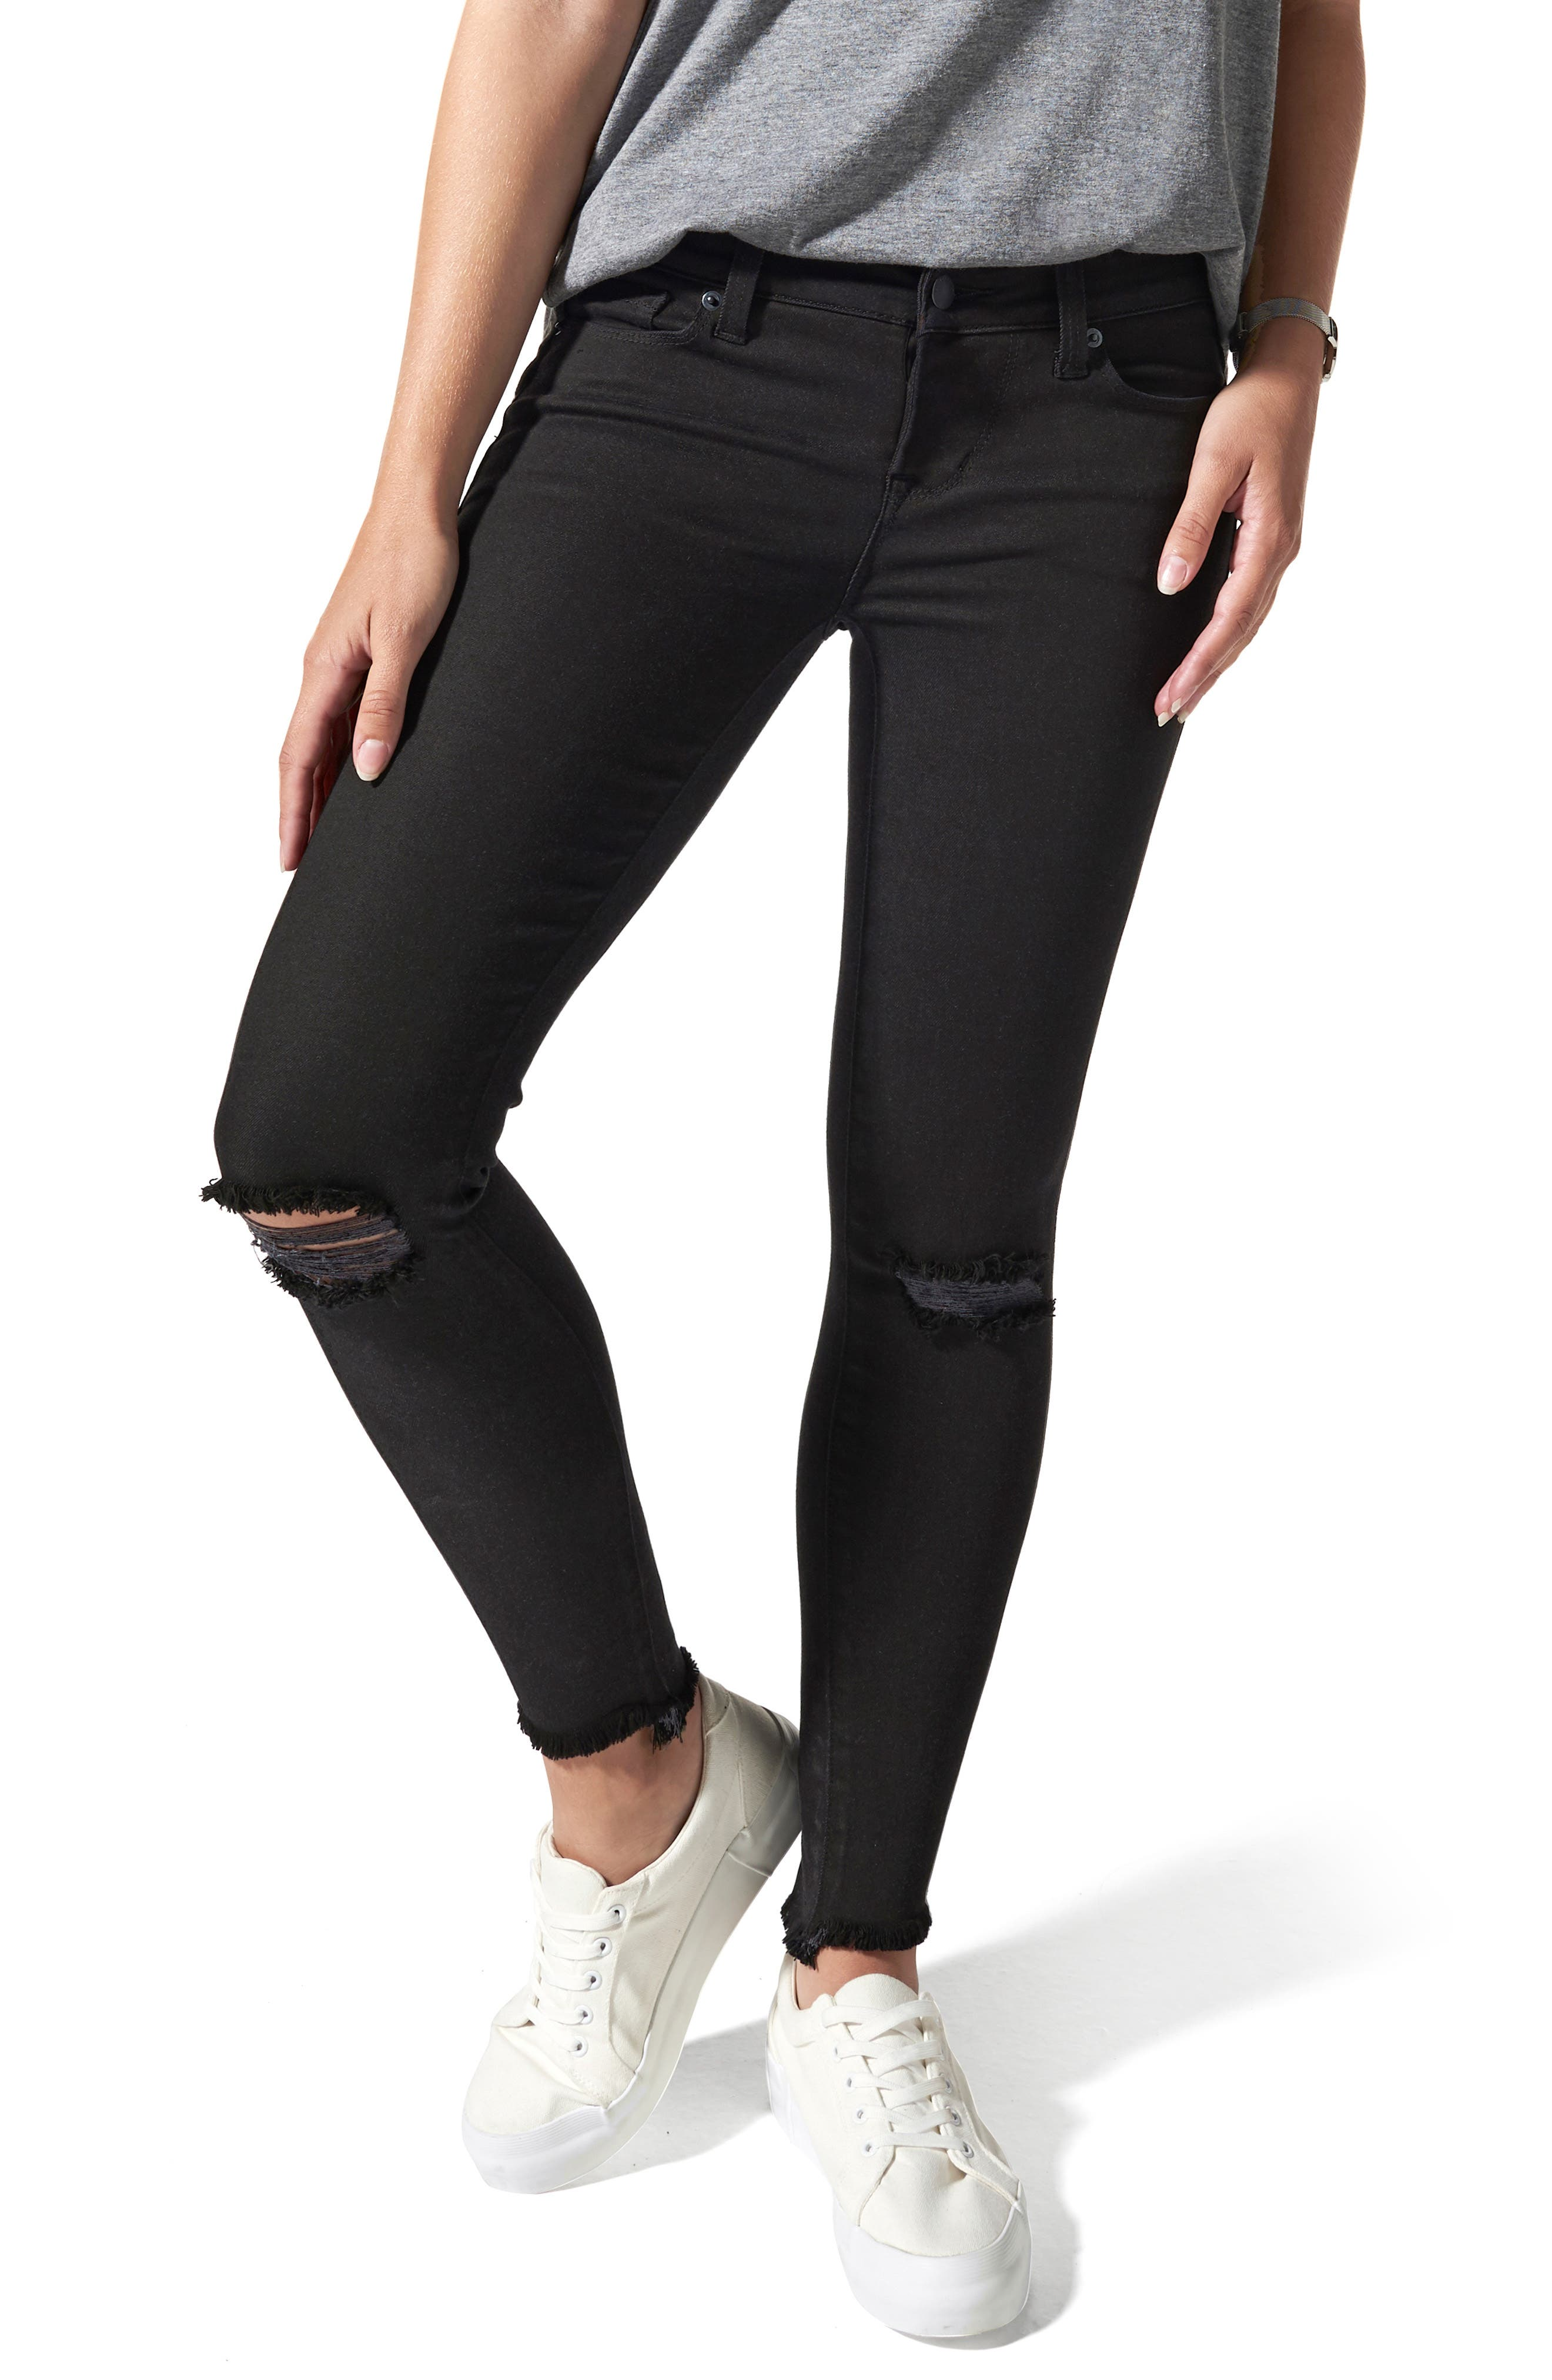 Ripped Postpartum/nursing Skinny Jeans